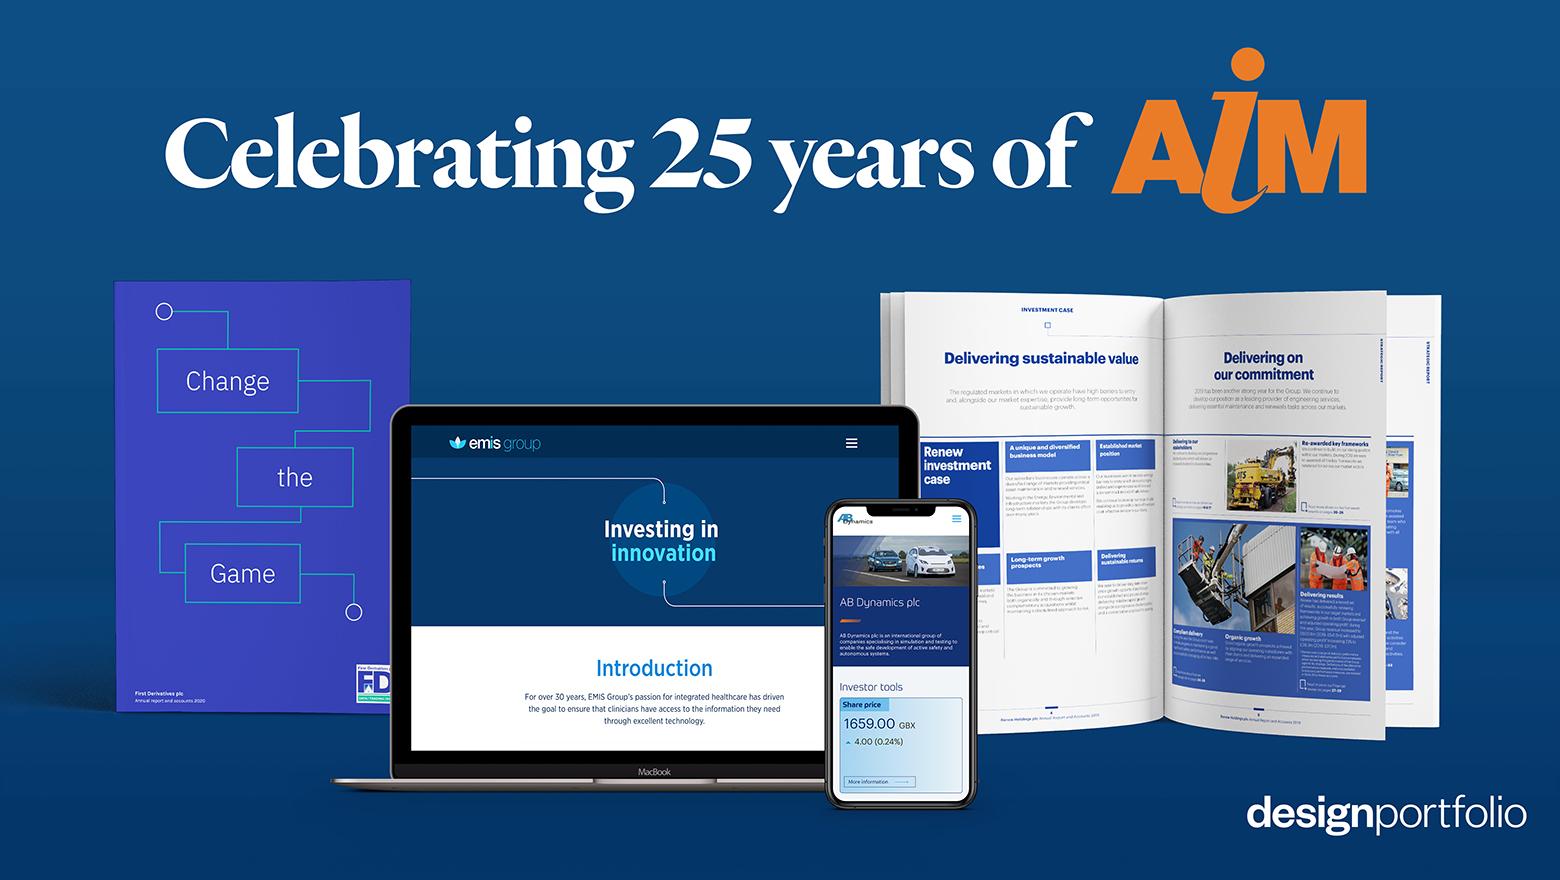 Celebrating 25 years of AIM